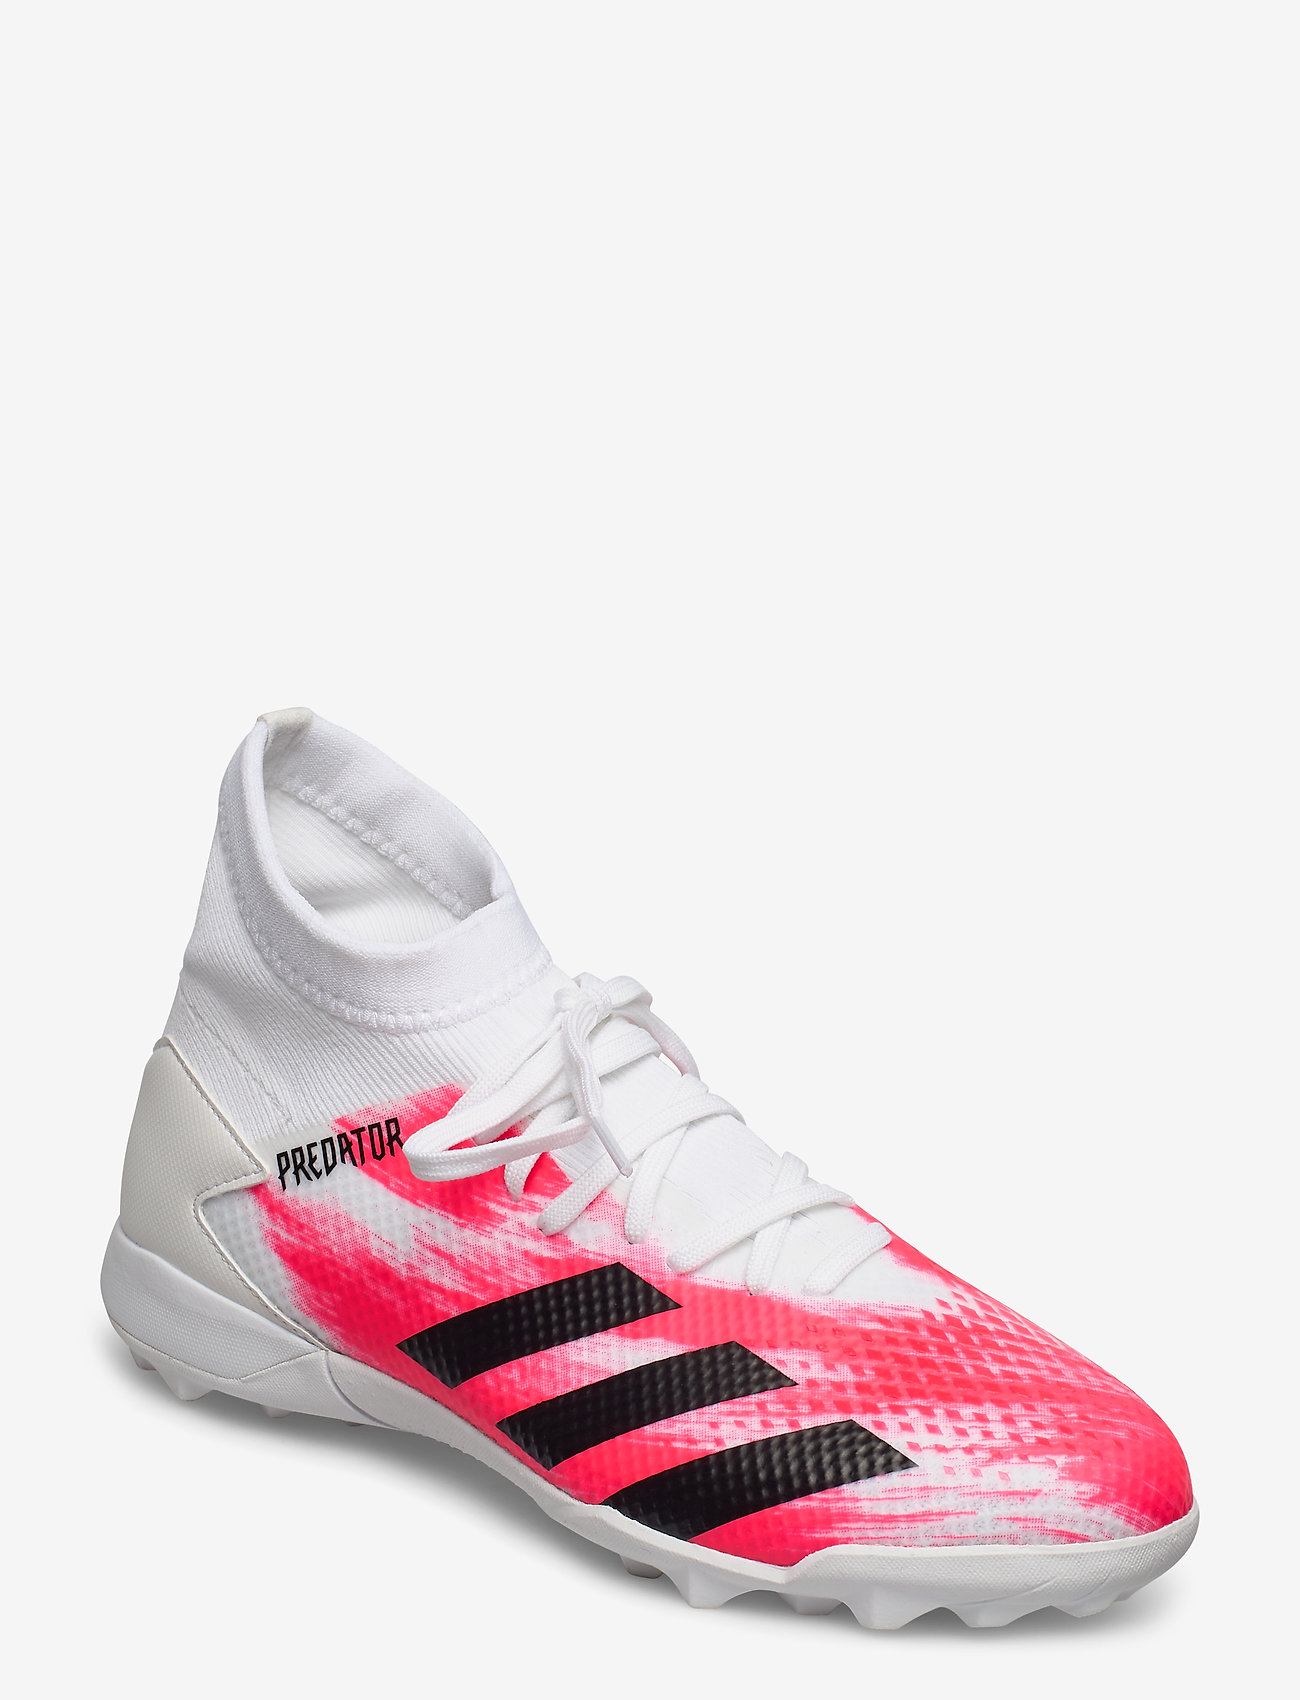 adidas Performance - PREDATOR 20.3 TF - fodboldsko - ftwwht/cblack/pop - 0